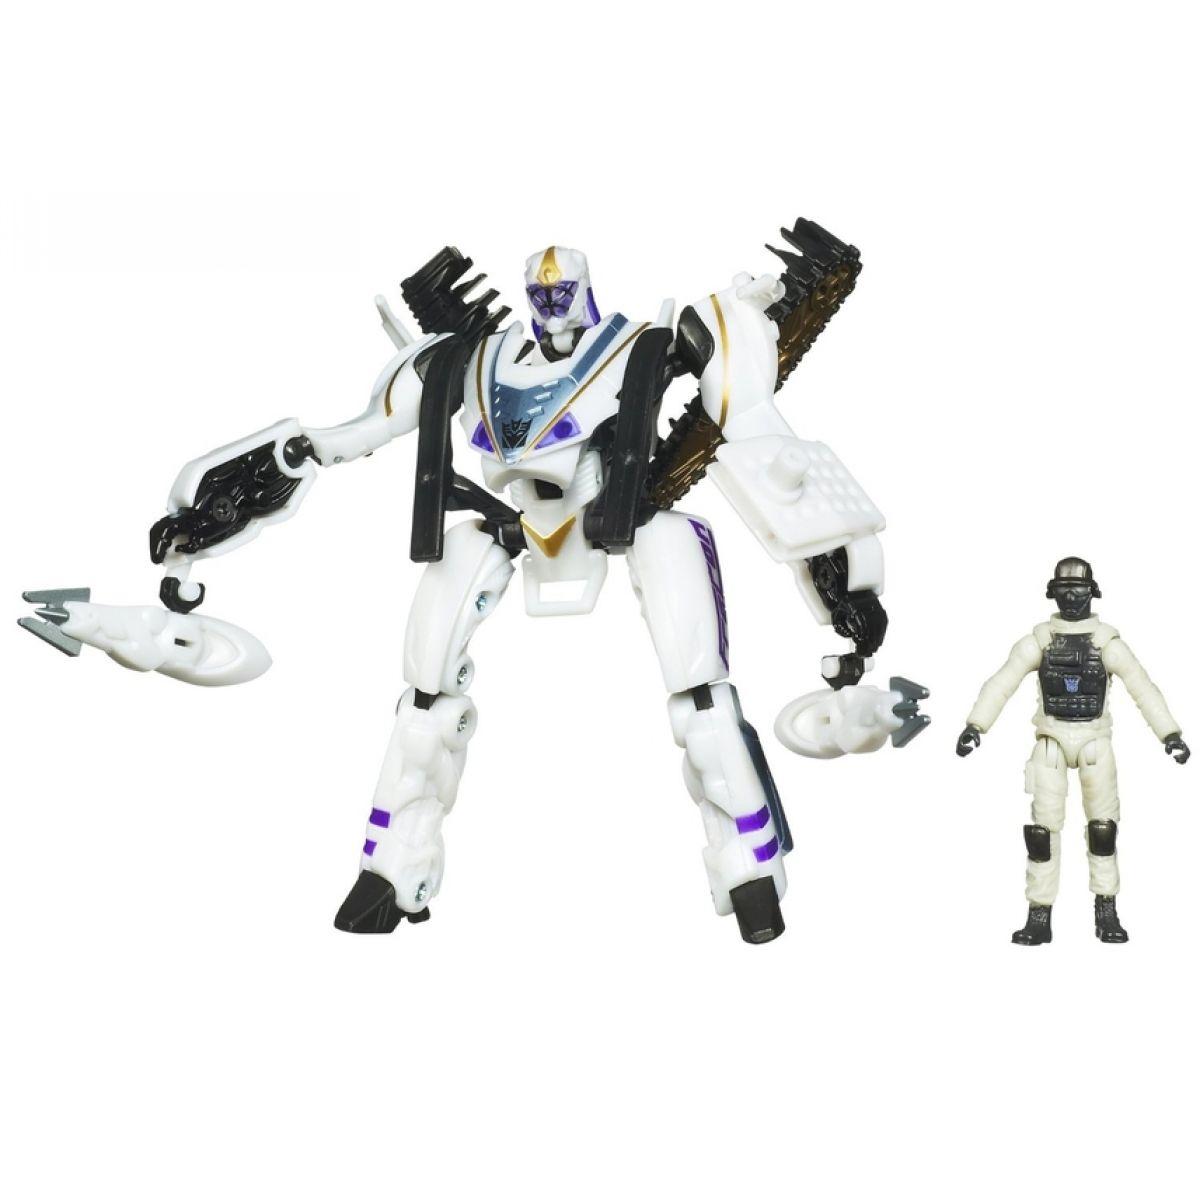 Transformers human alliance základní figurka Hasbro 28752 - Sergeant Chaos a Icepick